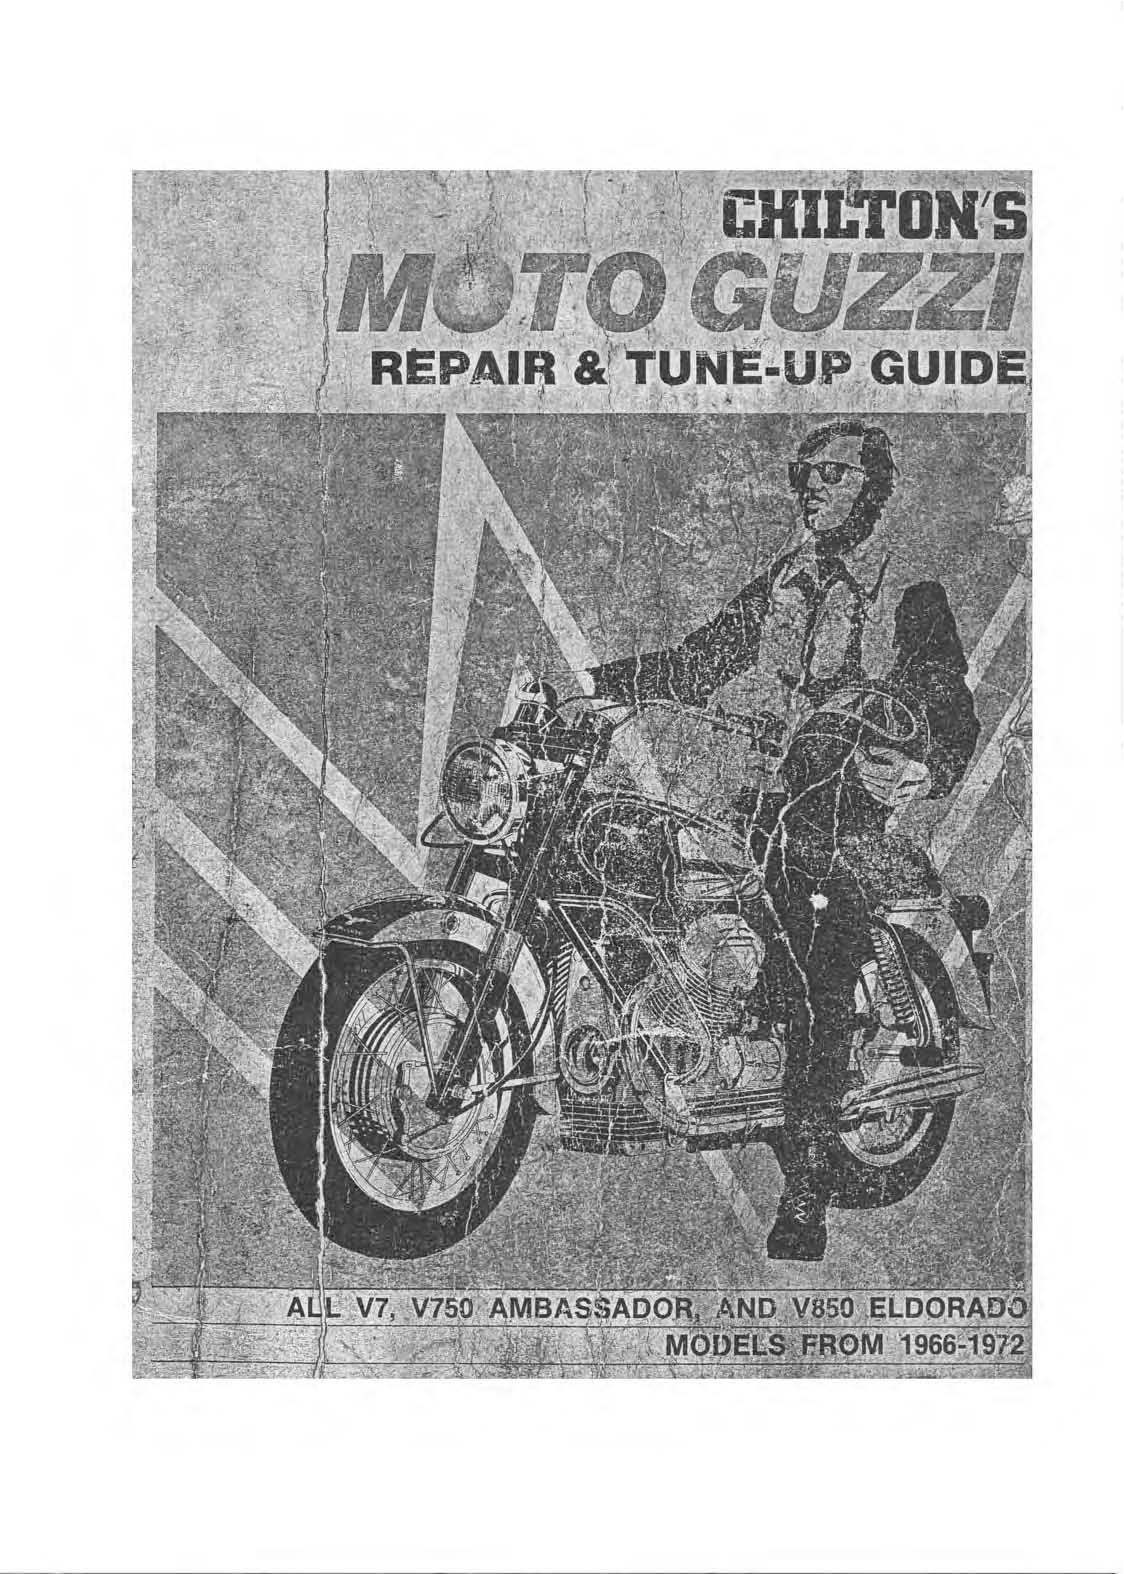 Moto Guzzi Chilton Repair Manual Pdf Download - Service Manual